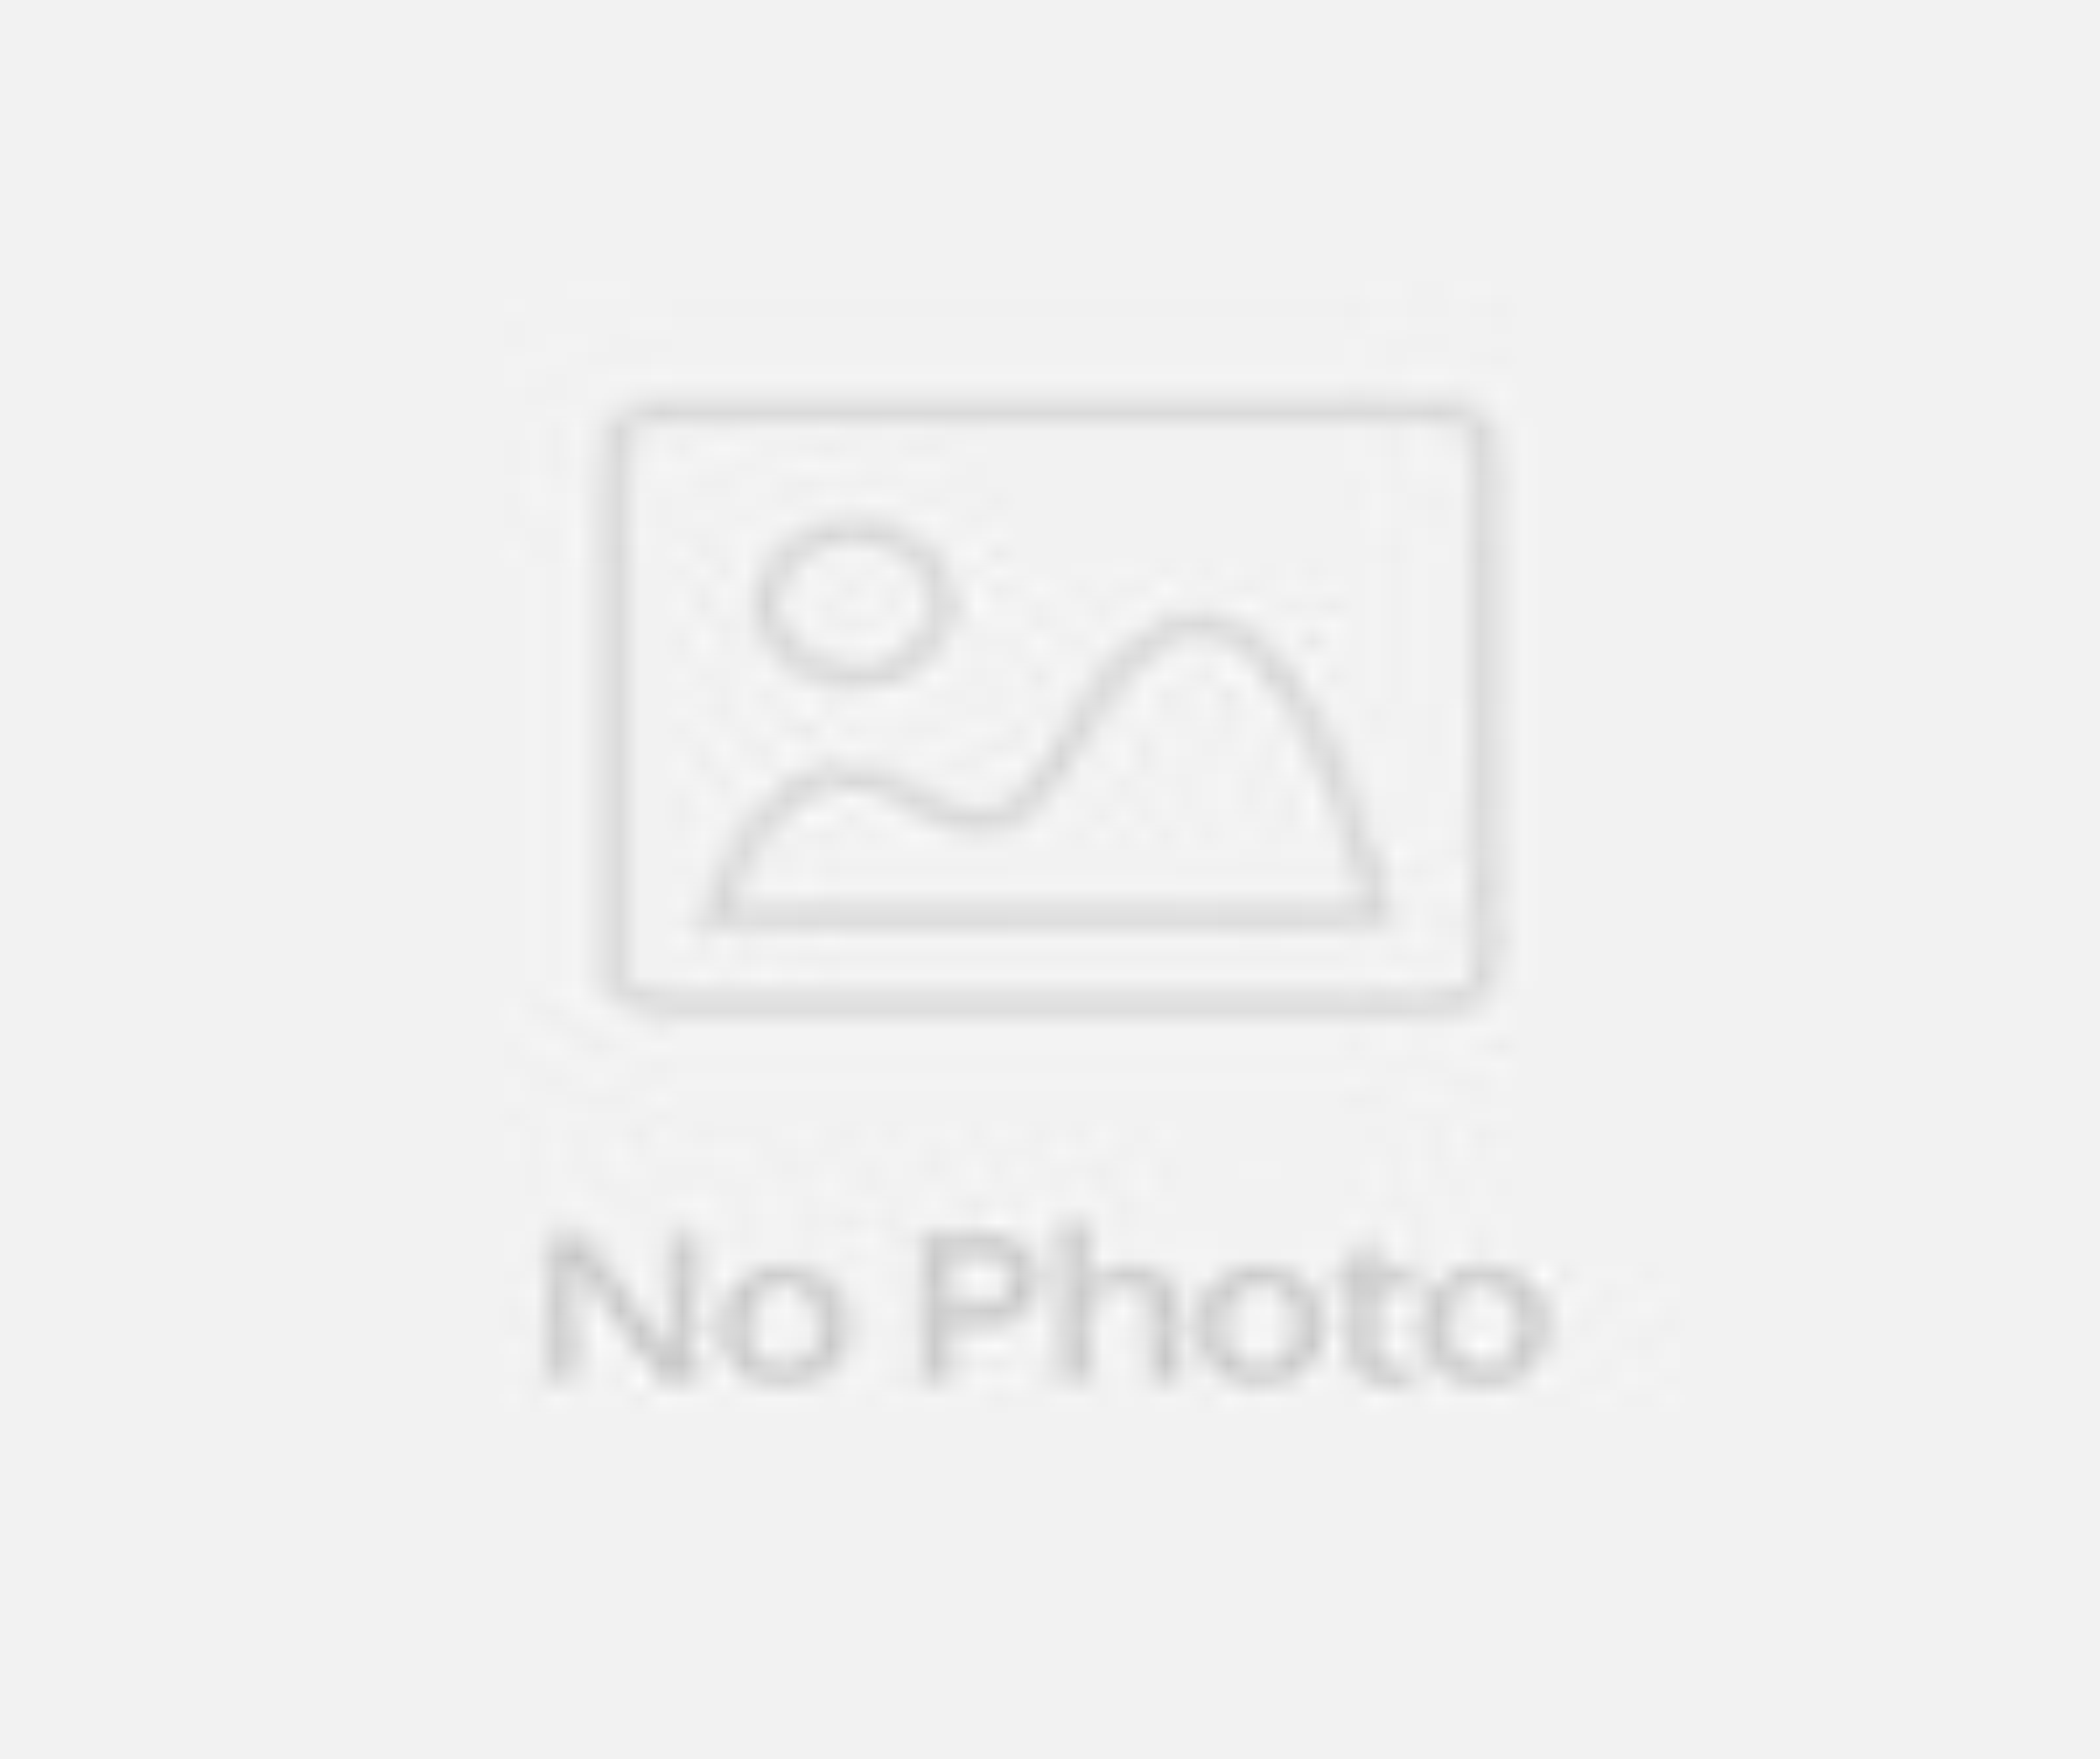 Bashan 300cc mini atv 4x4 with reverse gear